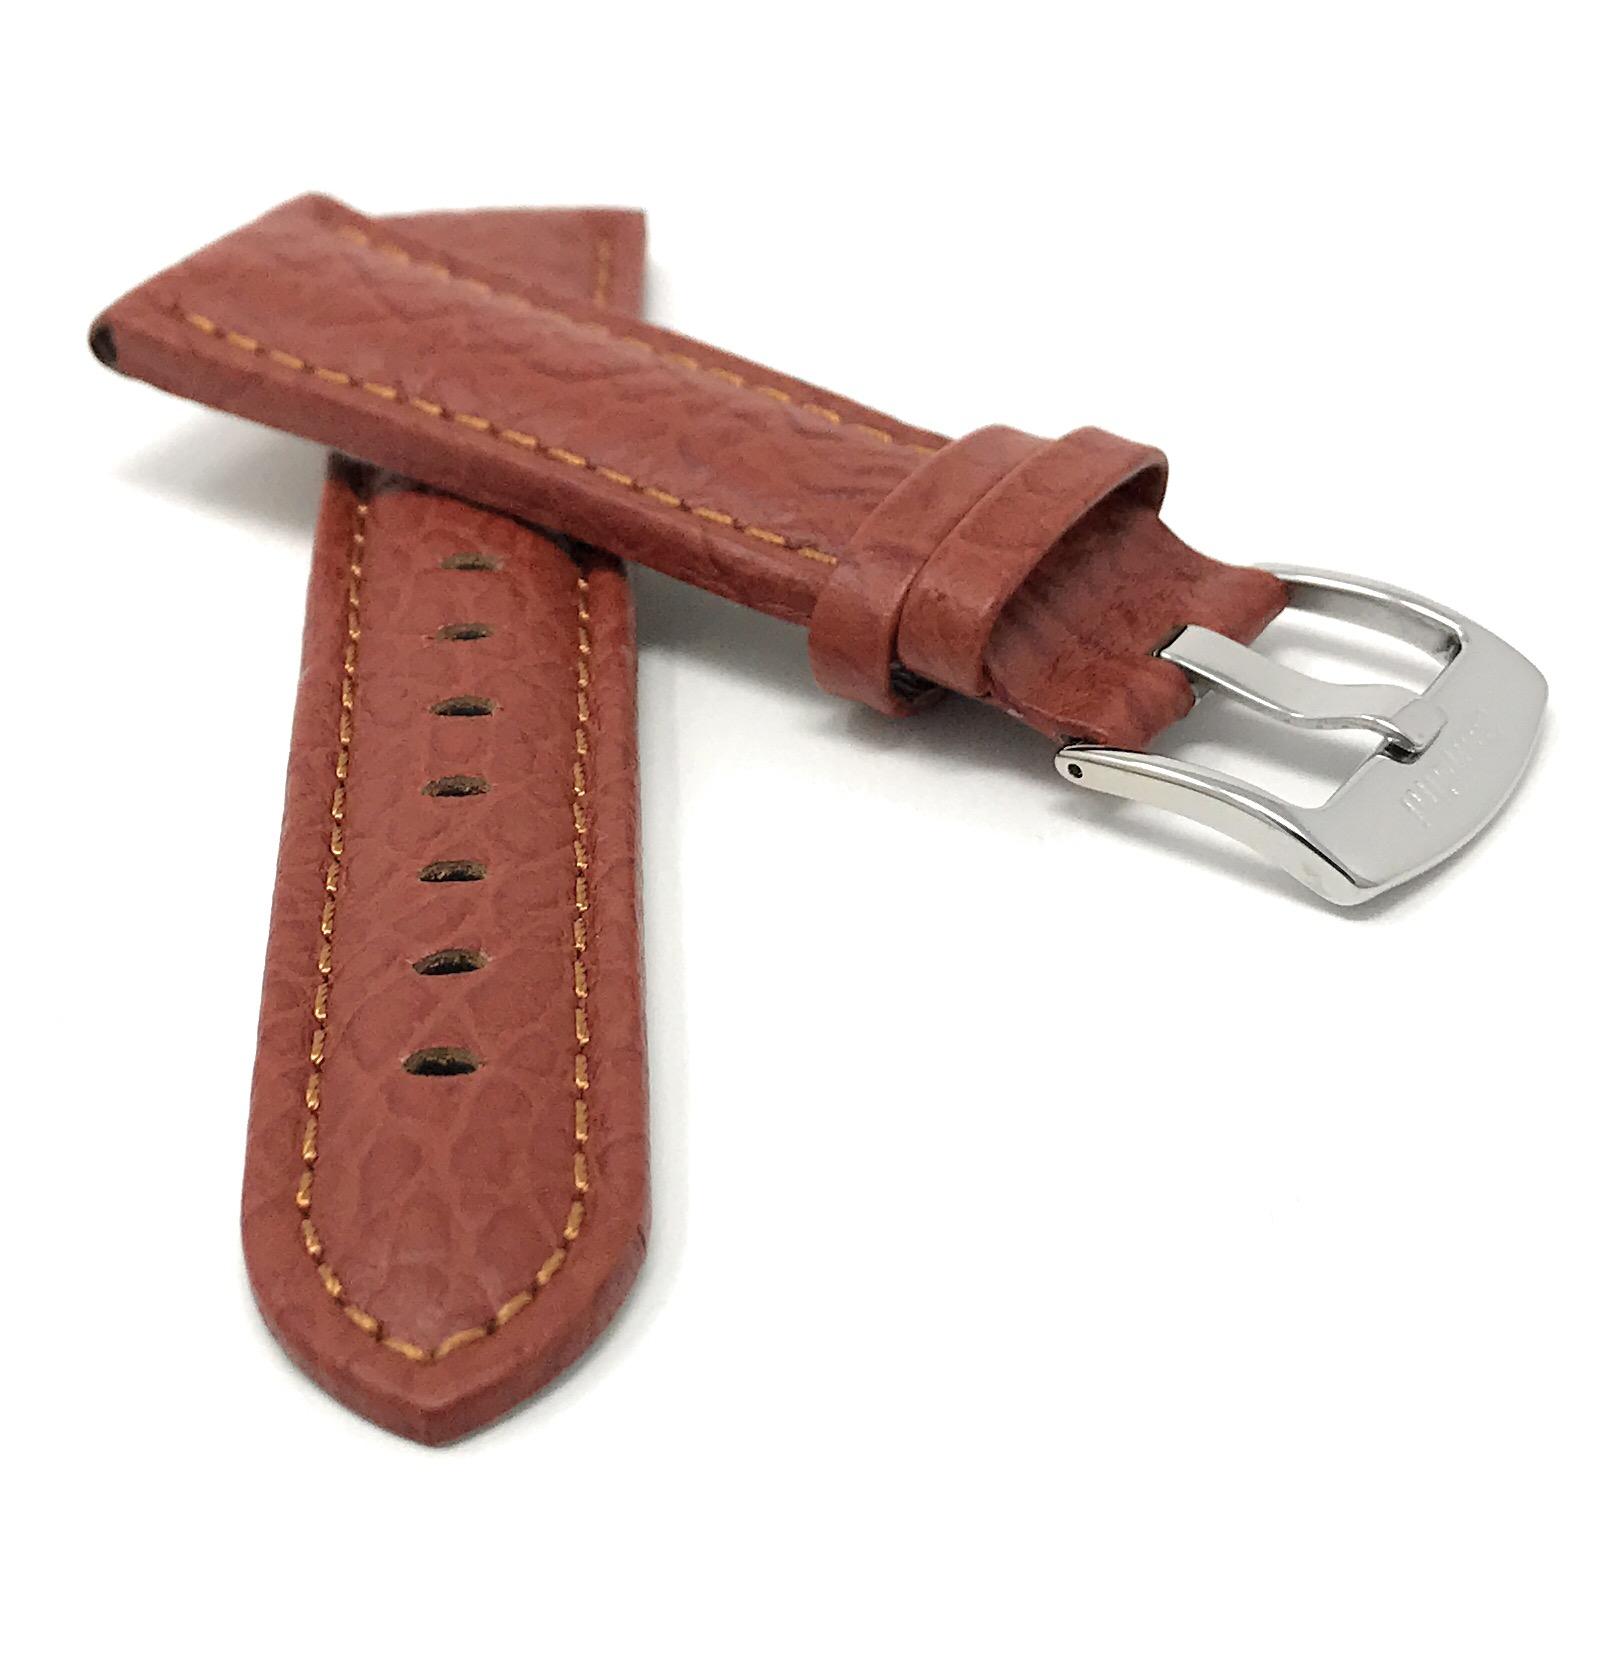 Bandini-Watch-Band-Leather-Strap-Buffalo-Pattern-18mm-30mm-Extra-Long-Also thumbnail 14